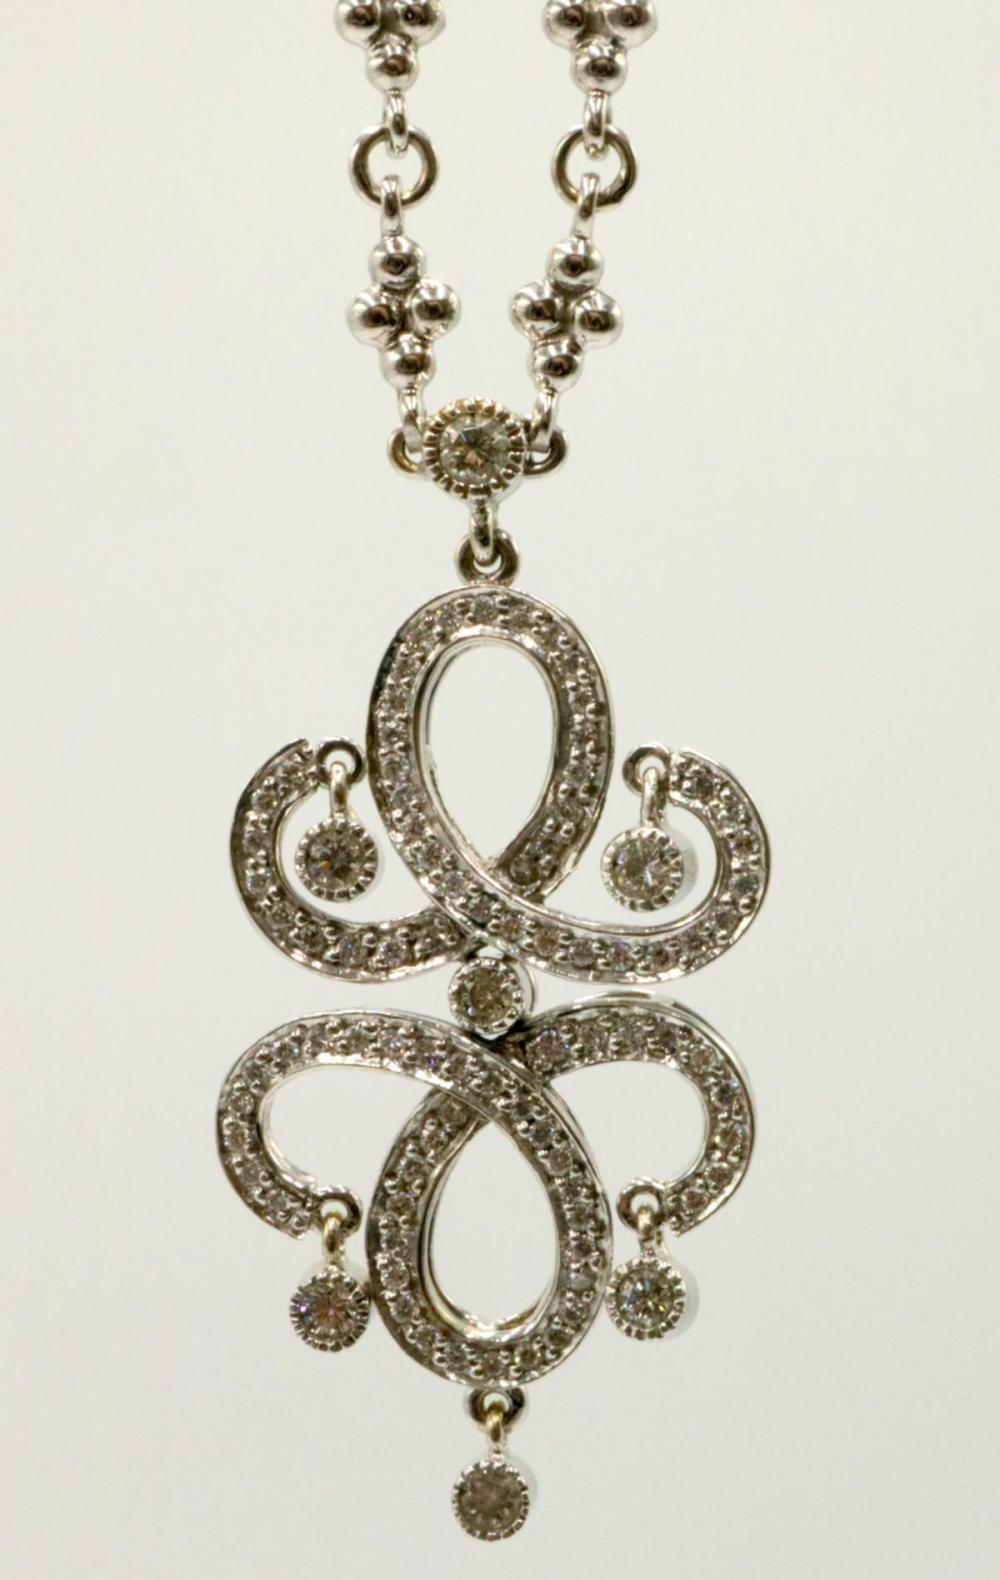 18Kt & Diamond Pendant w/ Necklace